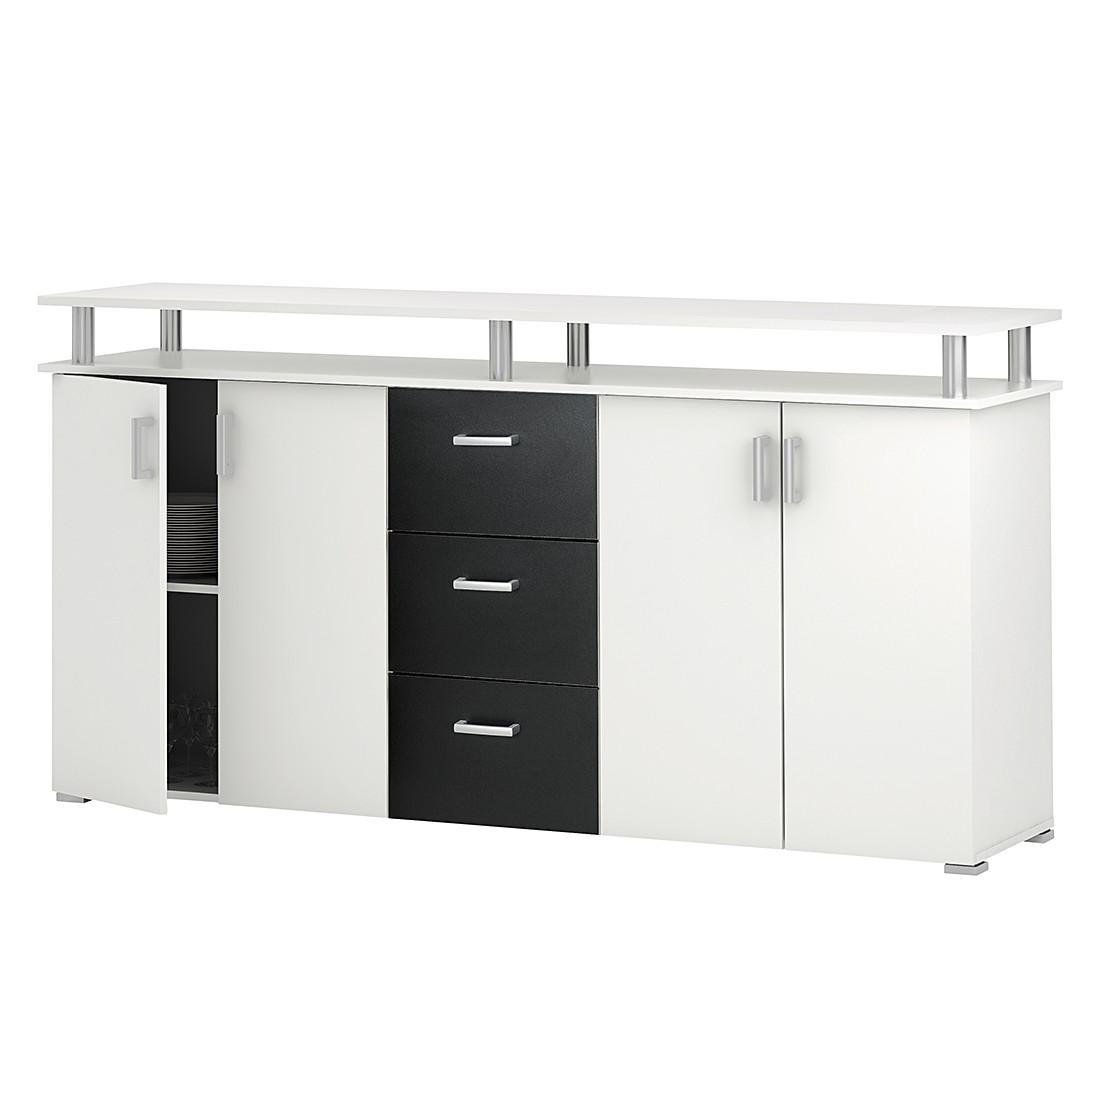 sideboard lara schwarz wei mooved online kaufen. Black Bedroom Furniture Sets. Home Design Ideas